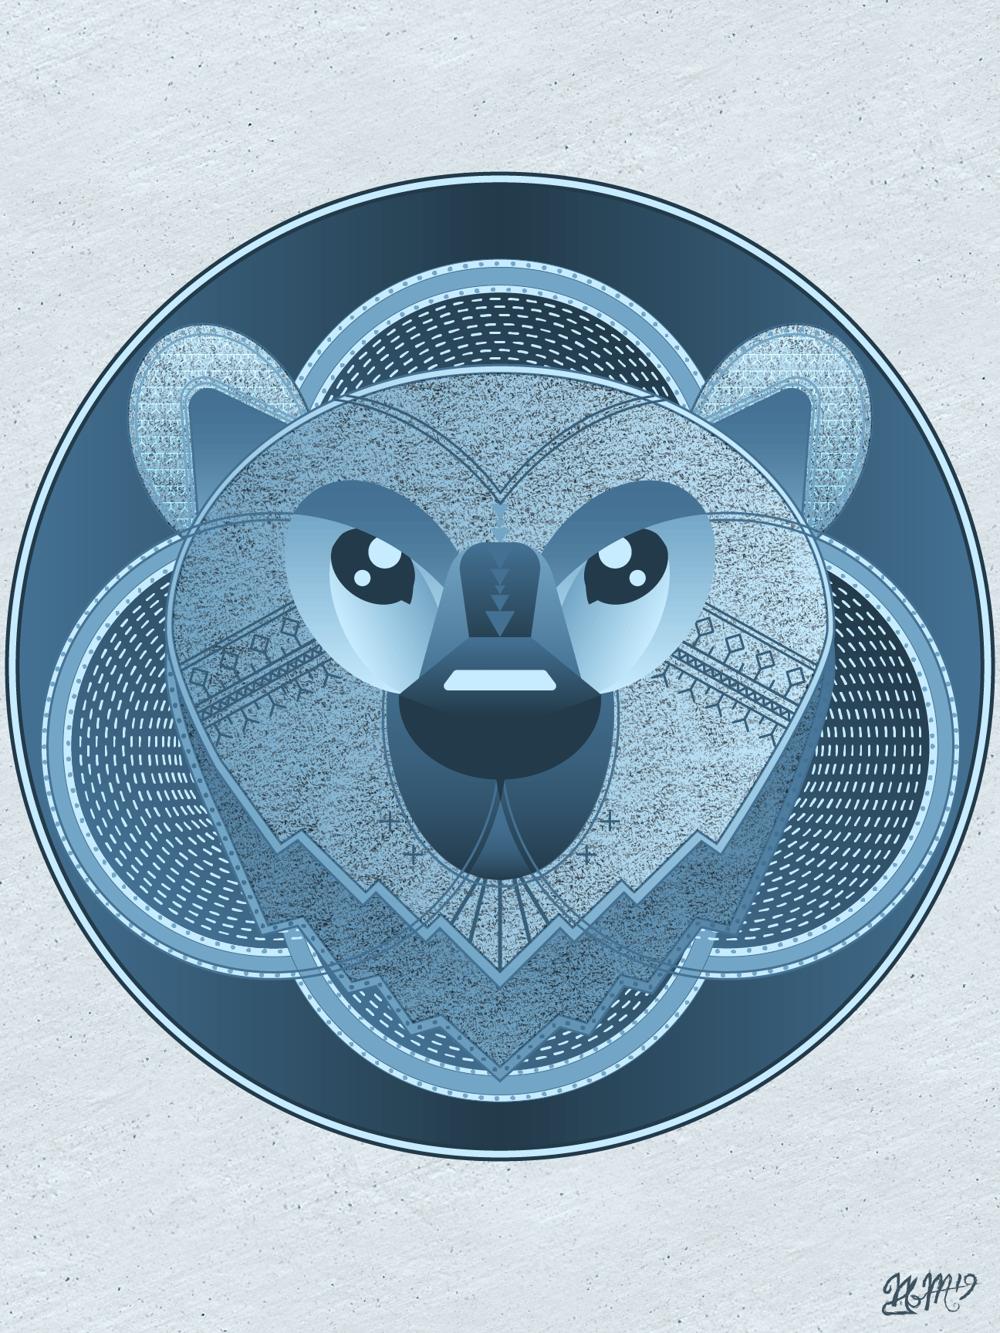 Polar Bear - image 7 - student project